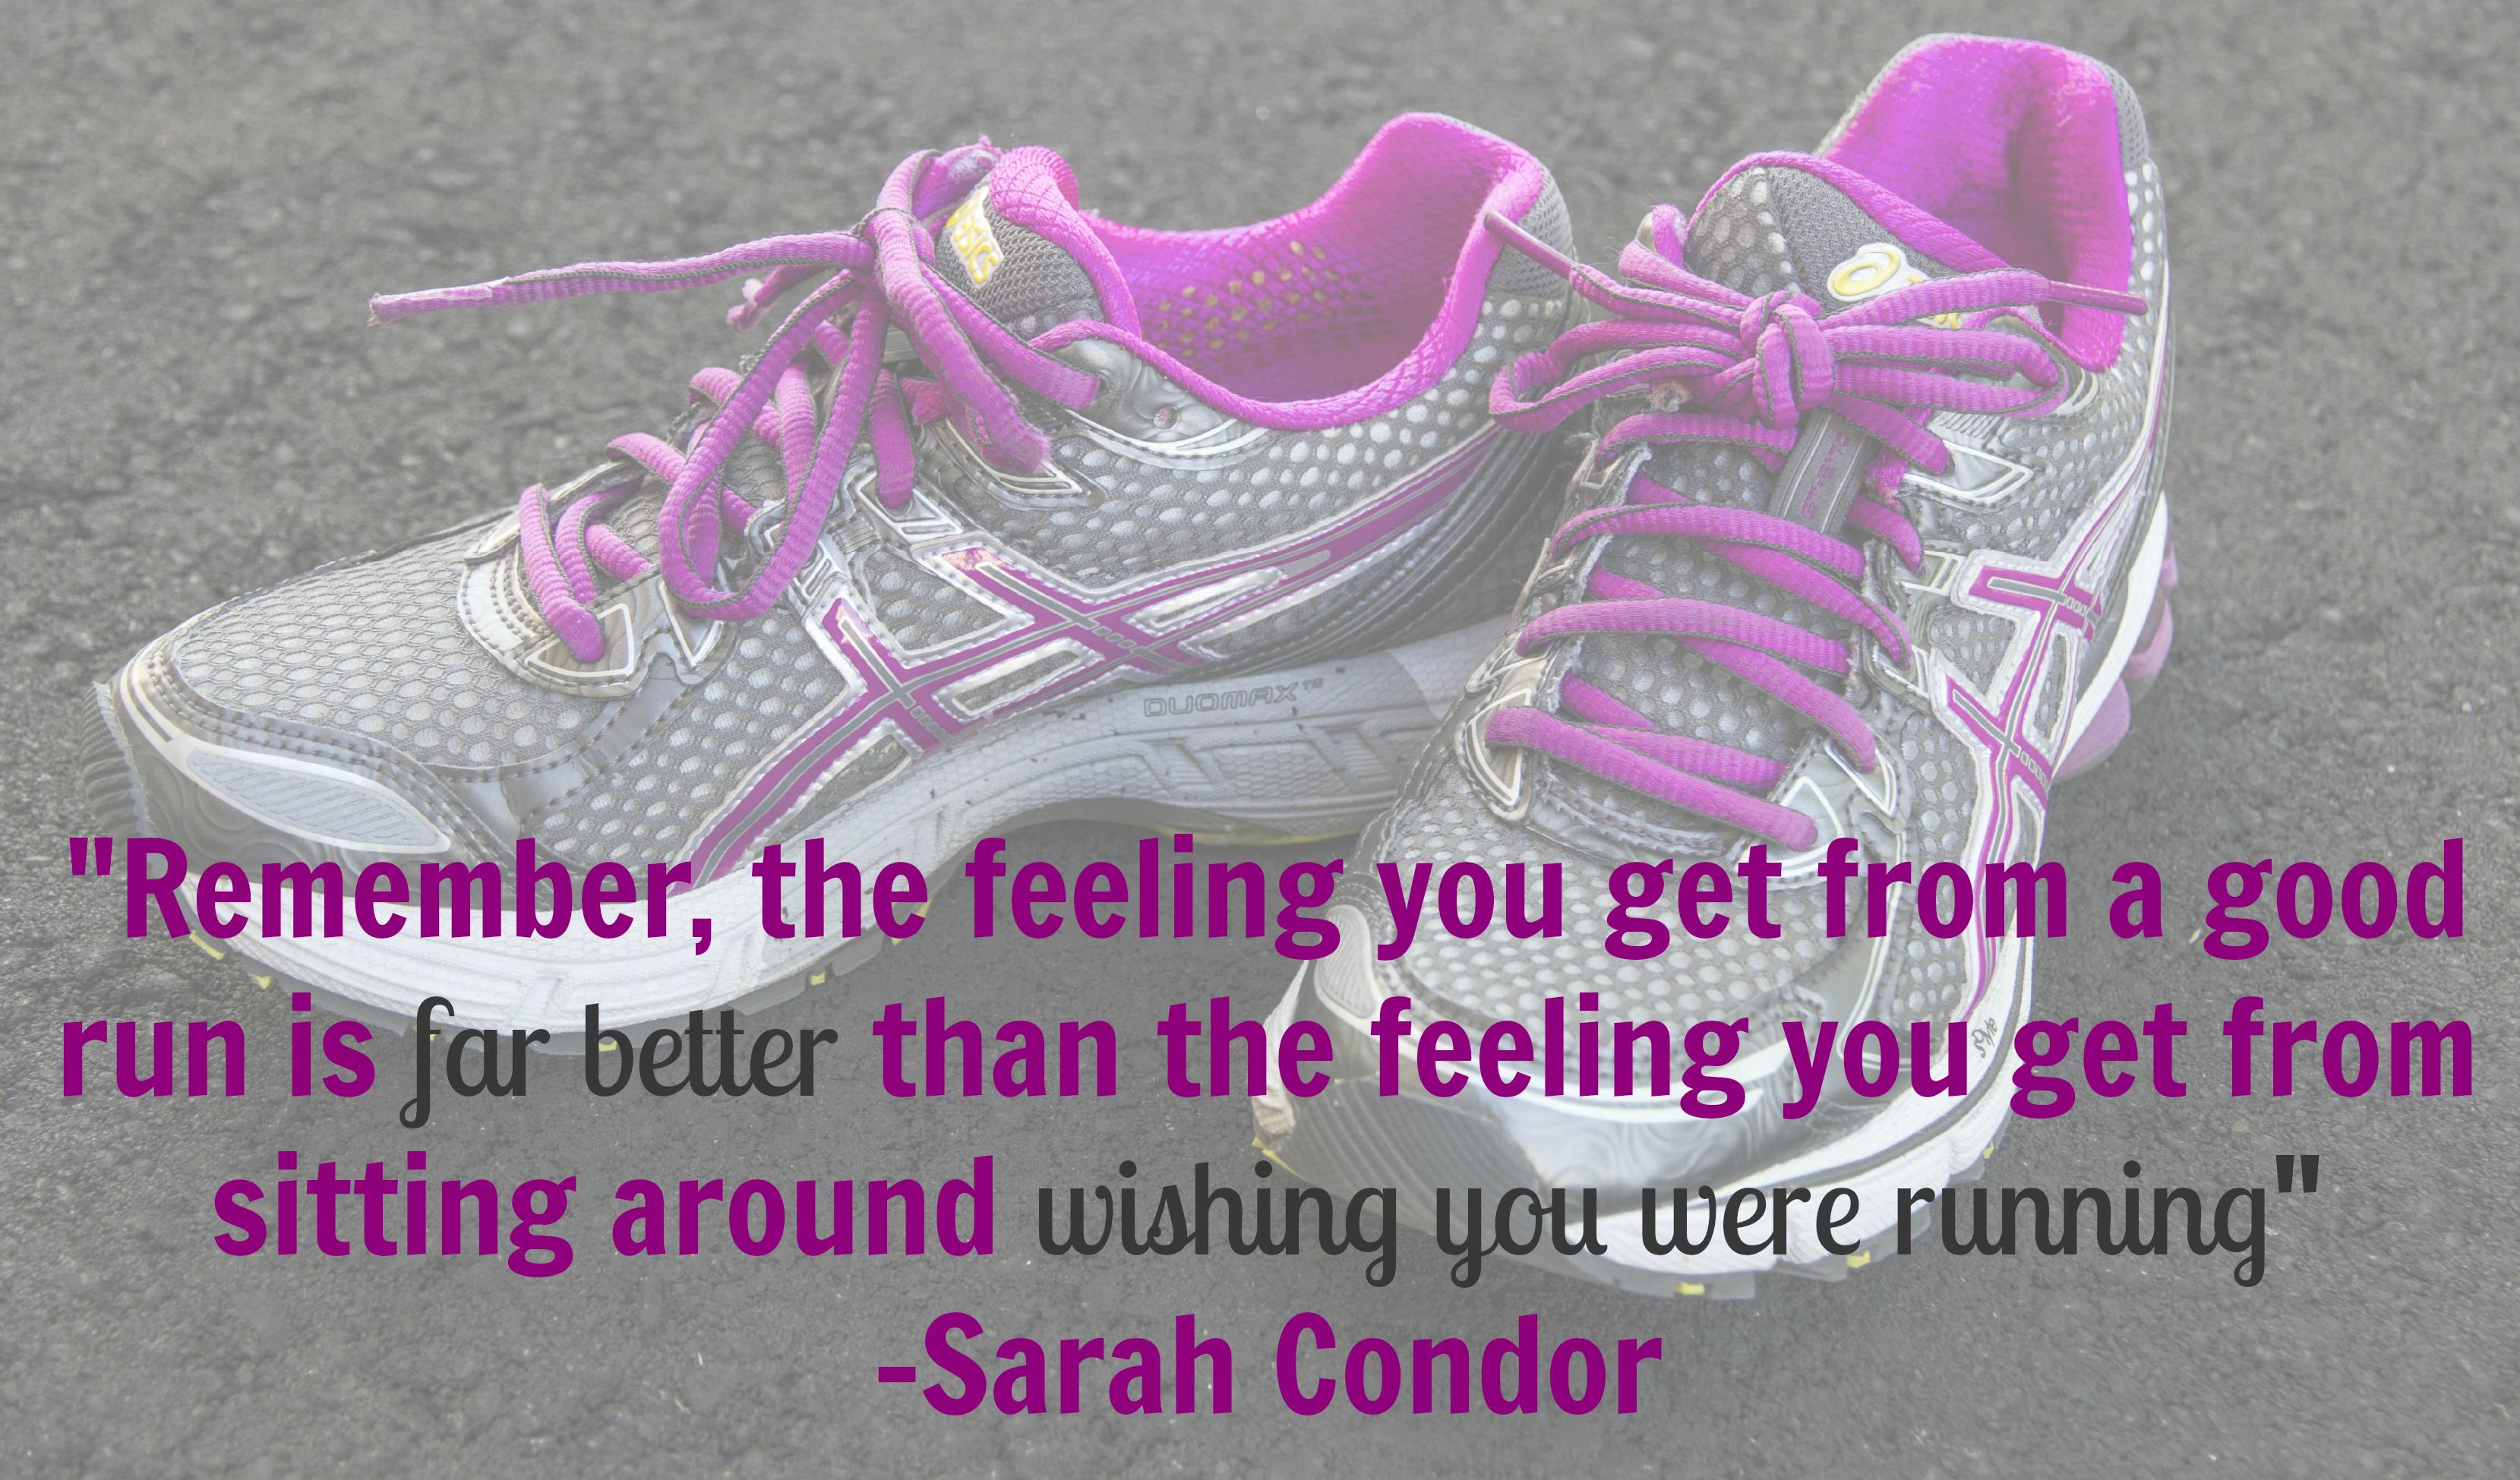 Running quote #8